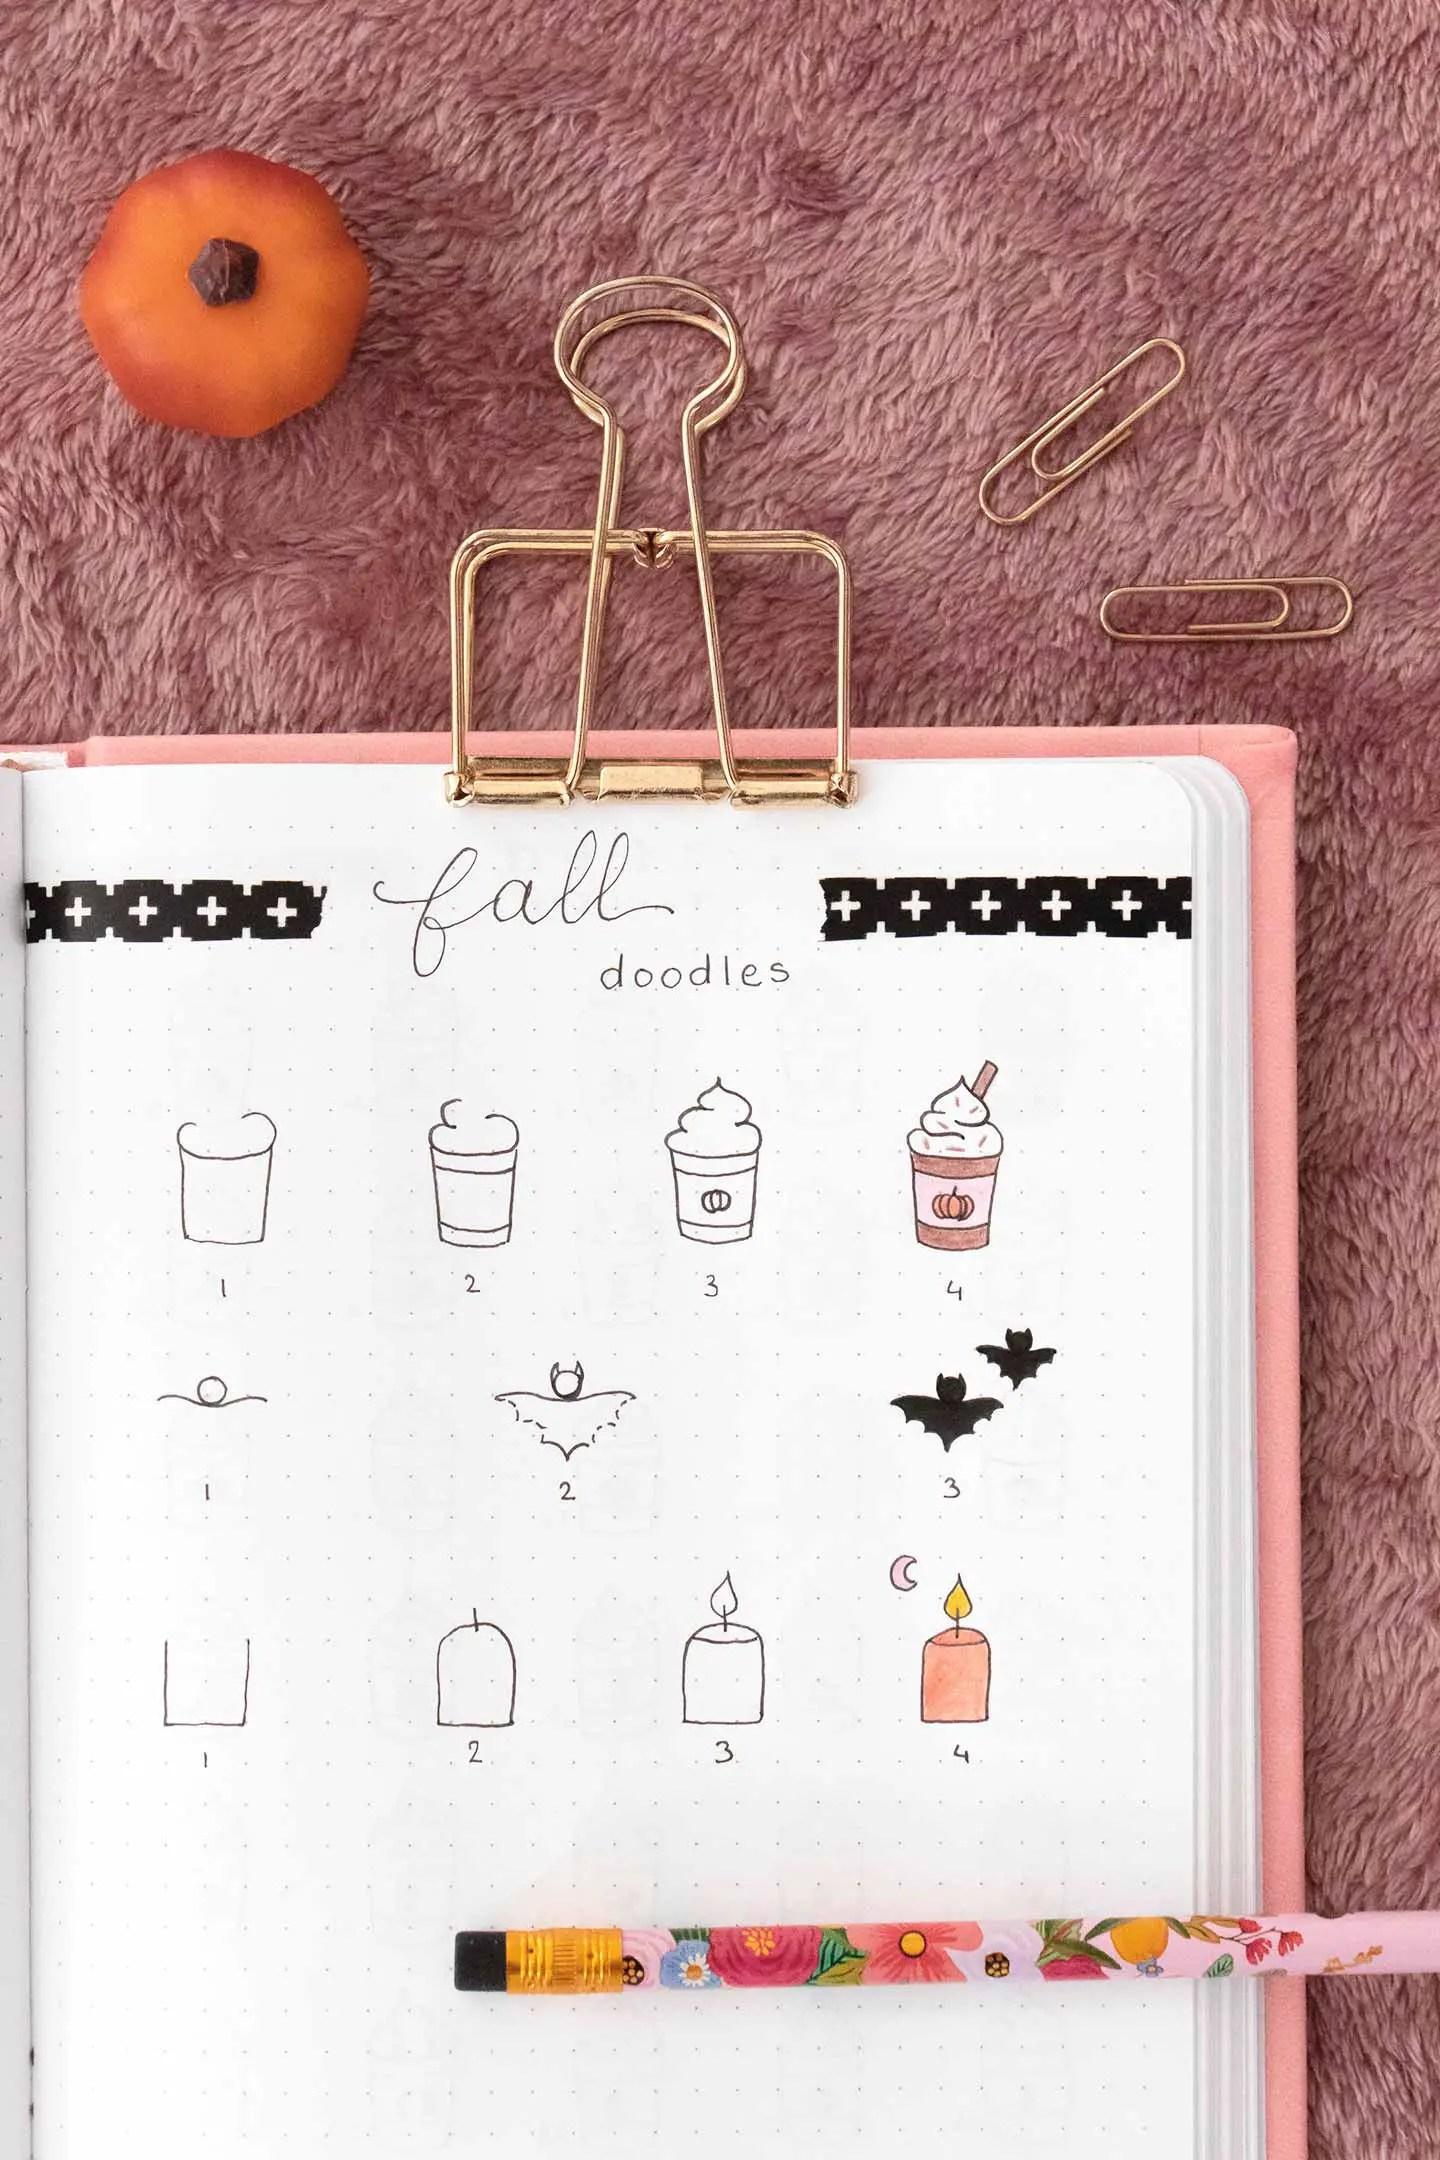 Doodles bullet journal